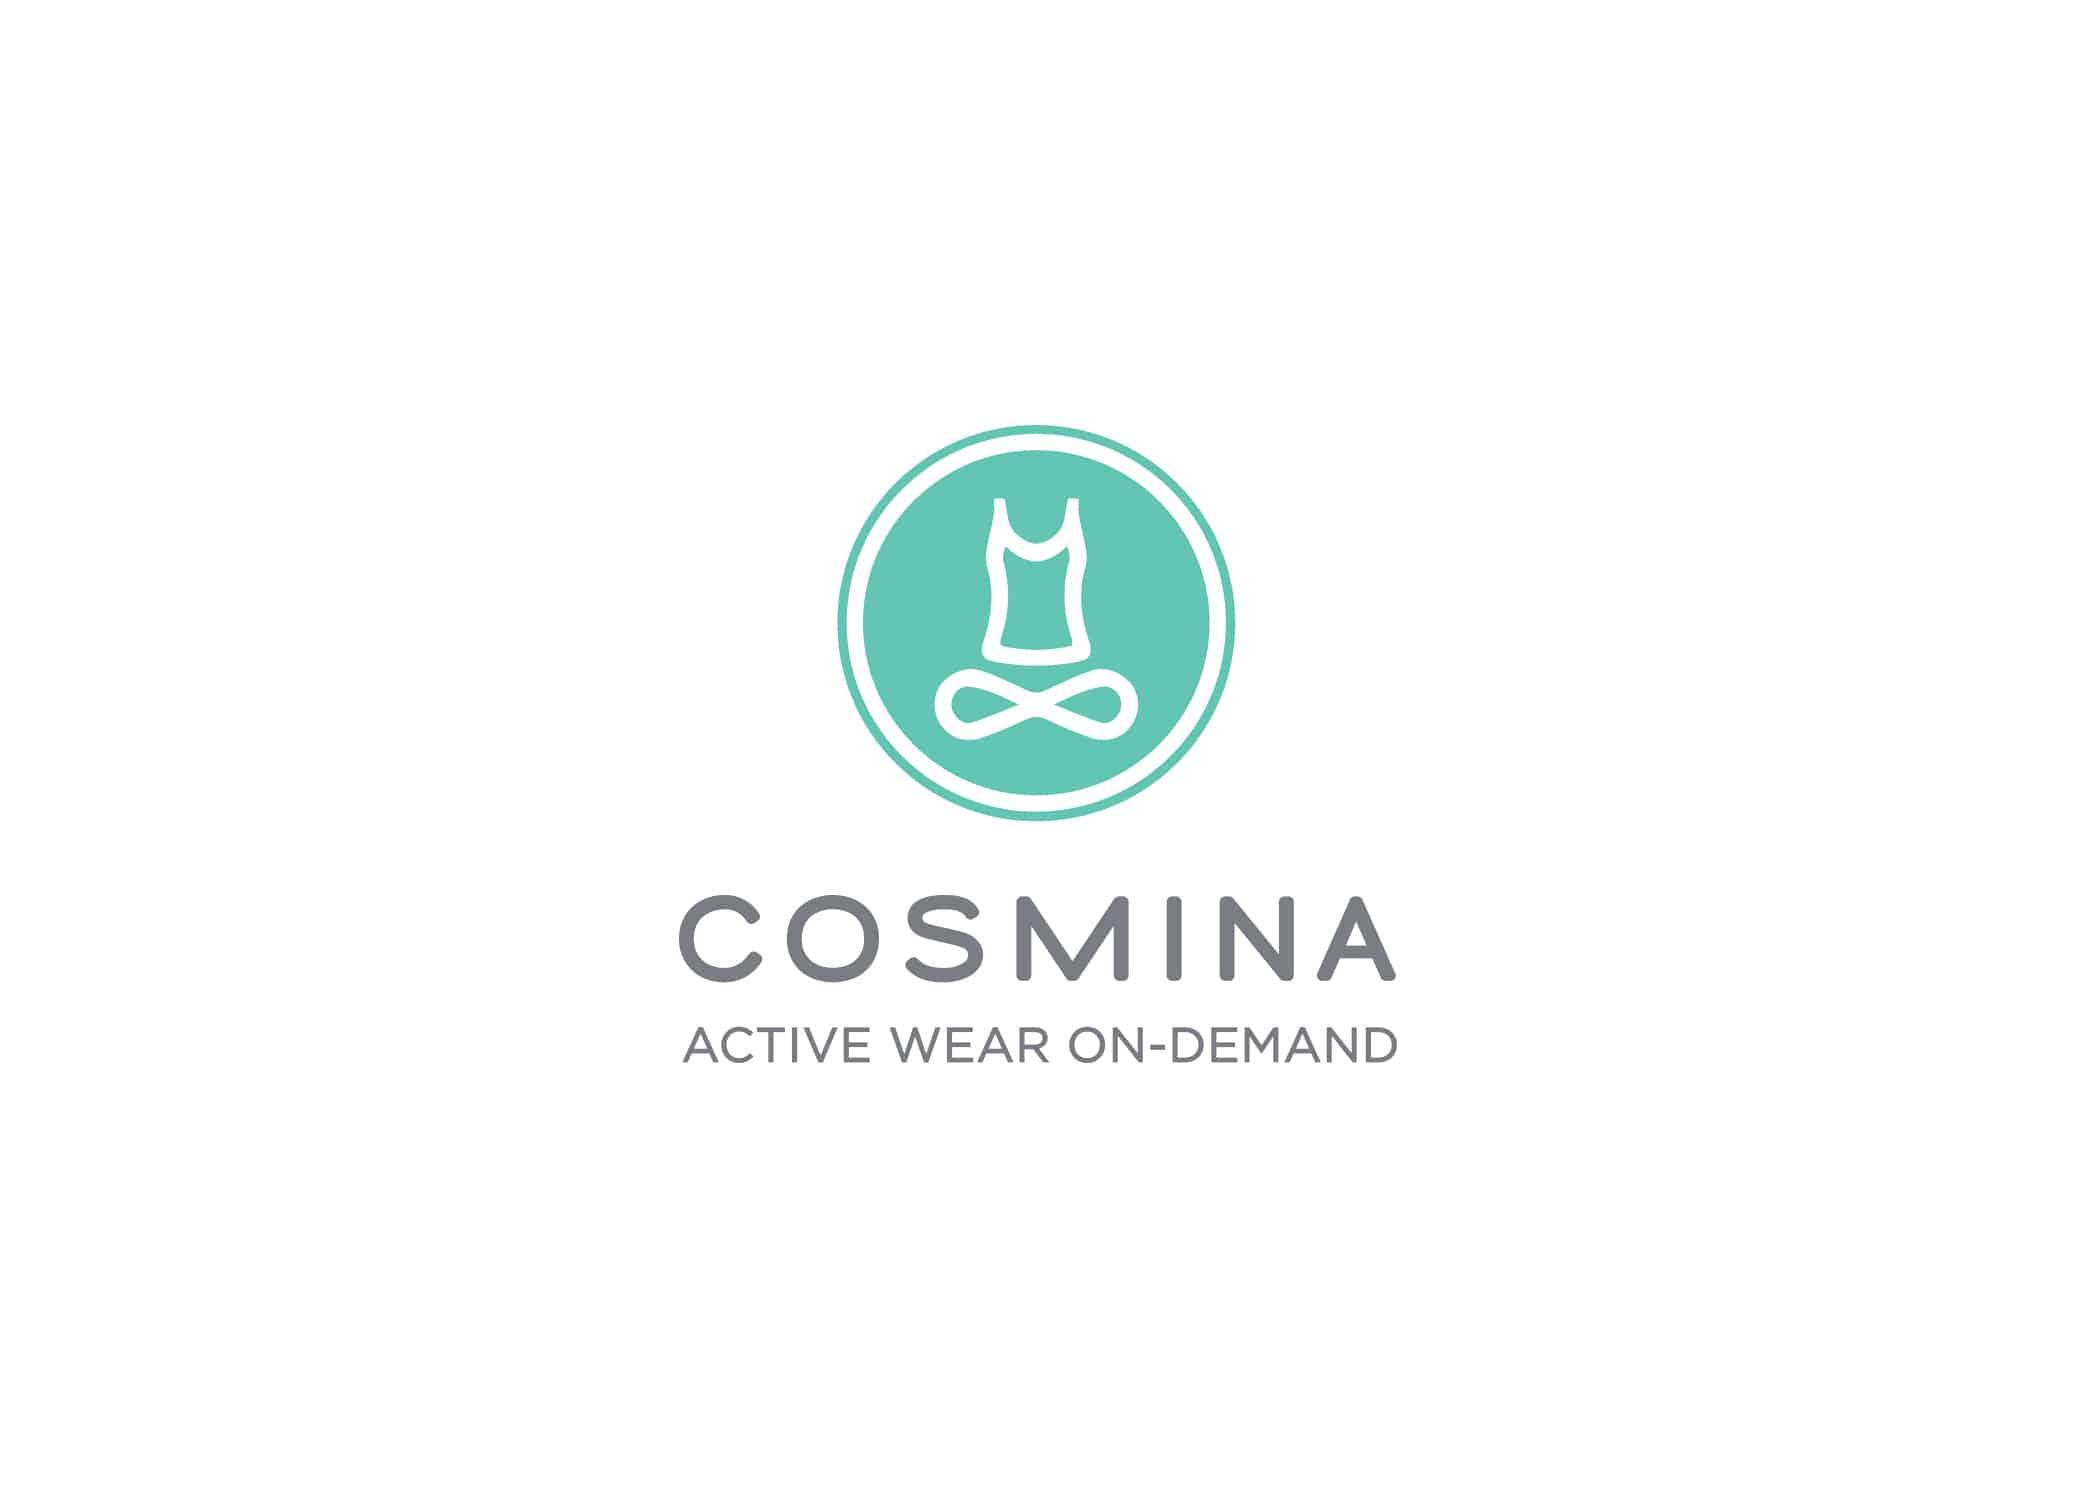 Cosmina logo design with blue yoga lotus position element inside a circle above grey logo typography.